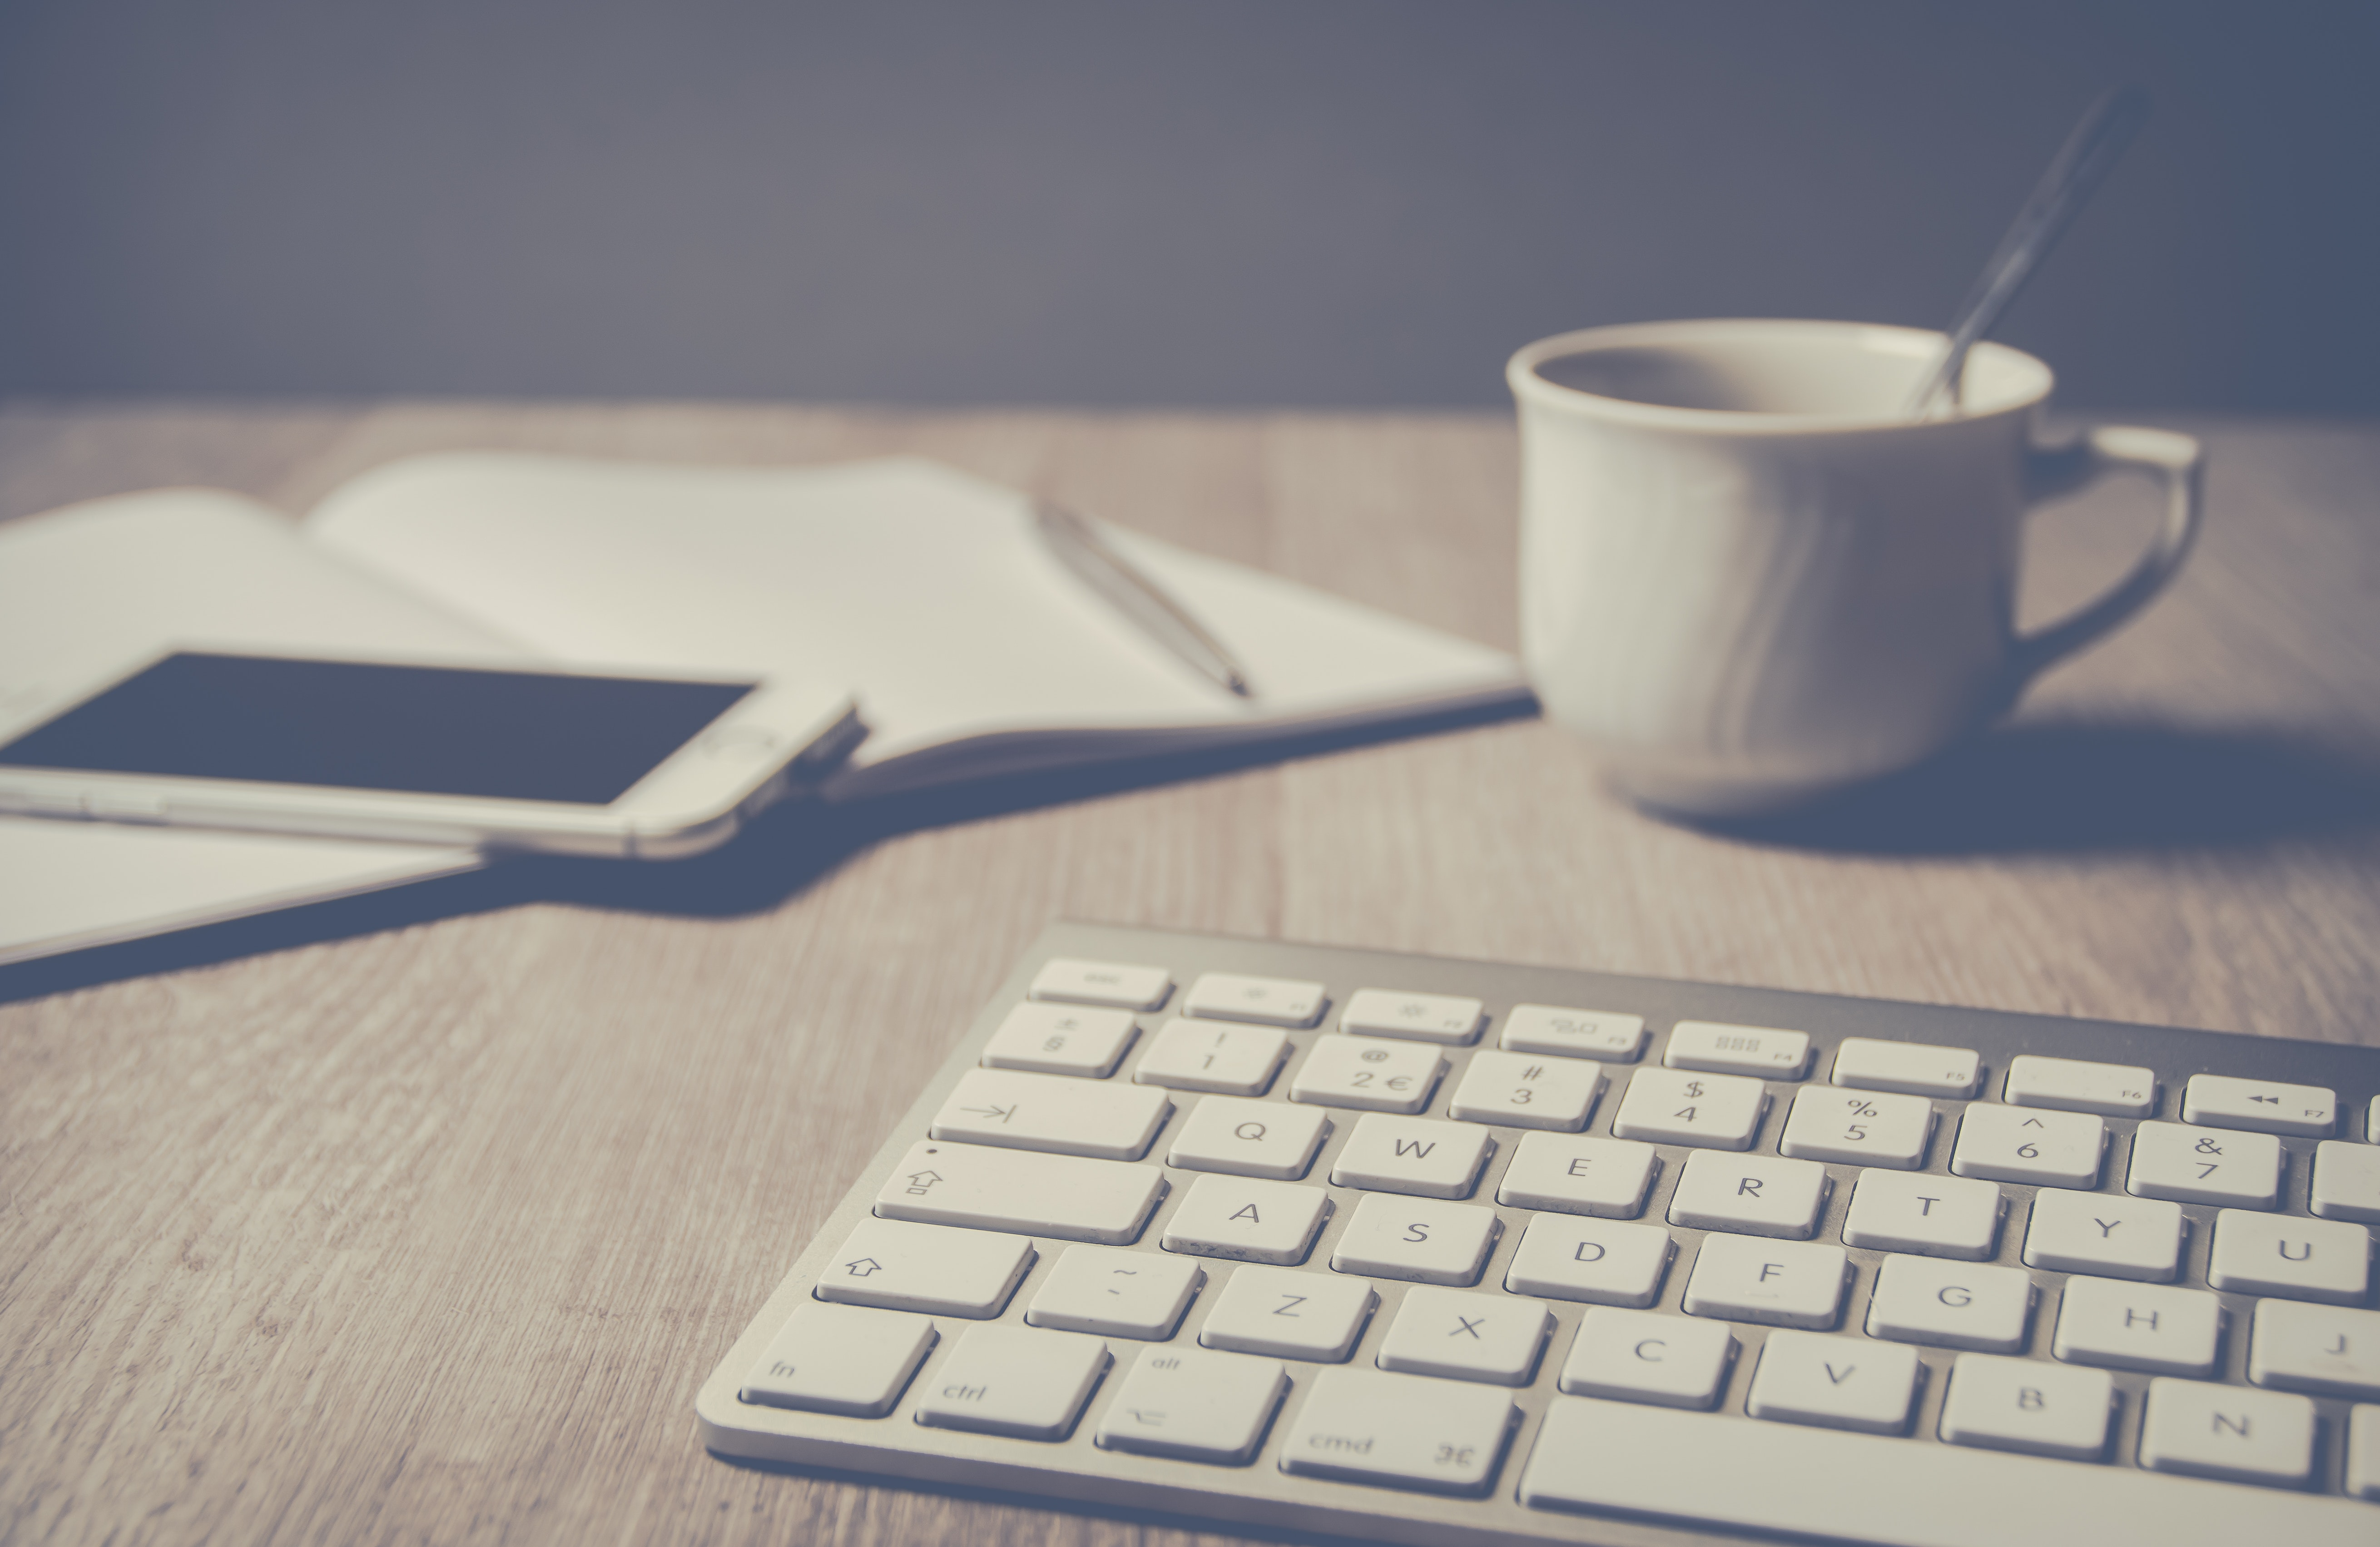 Magic Keyboard Beside Coffee Mug on Desk, Ballpen, Mobile, Work space, Work area, HQ Photo